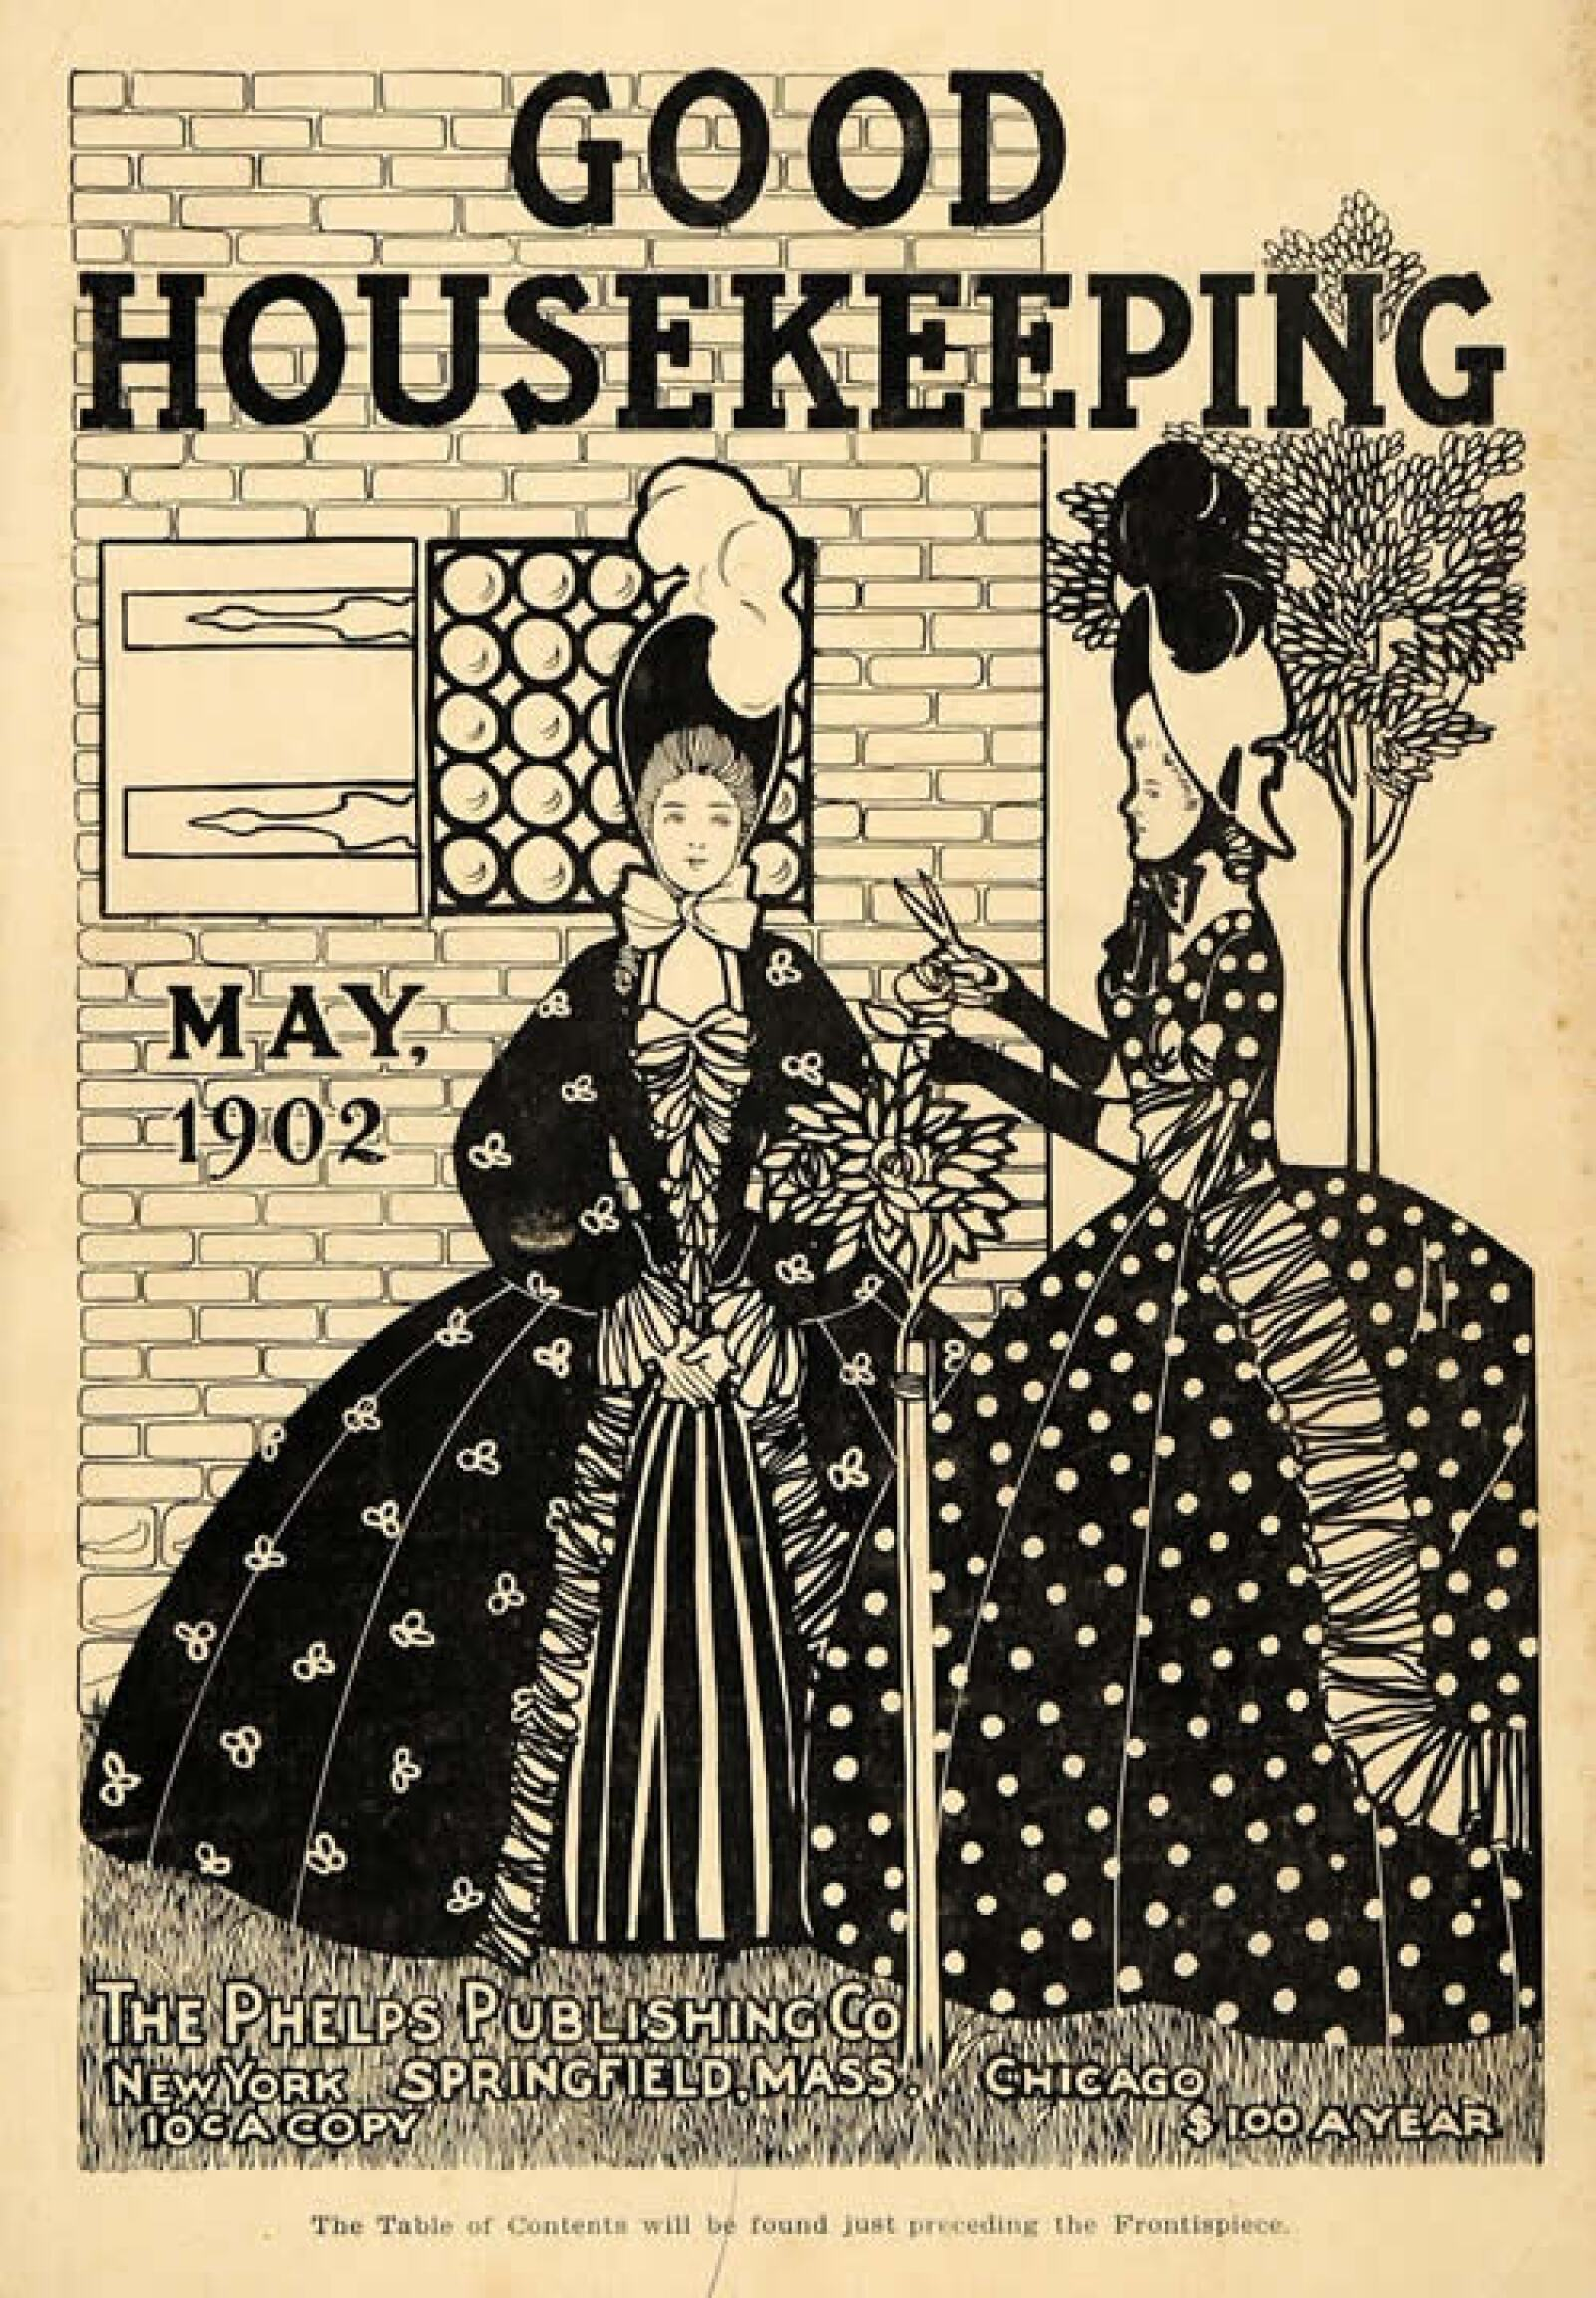 Good Housekeeping, mayo 1902